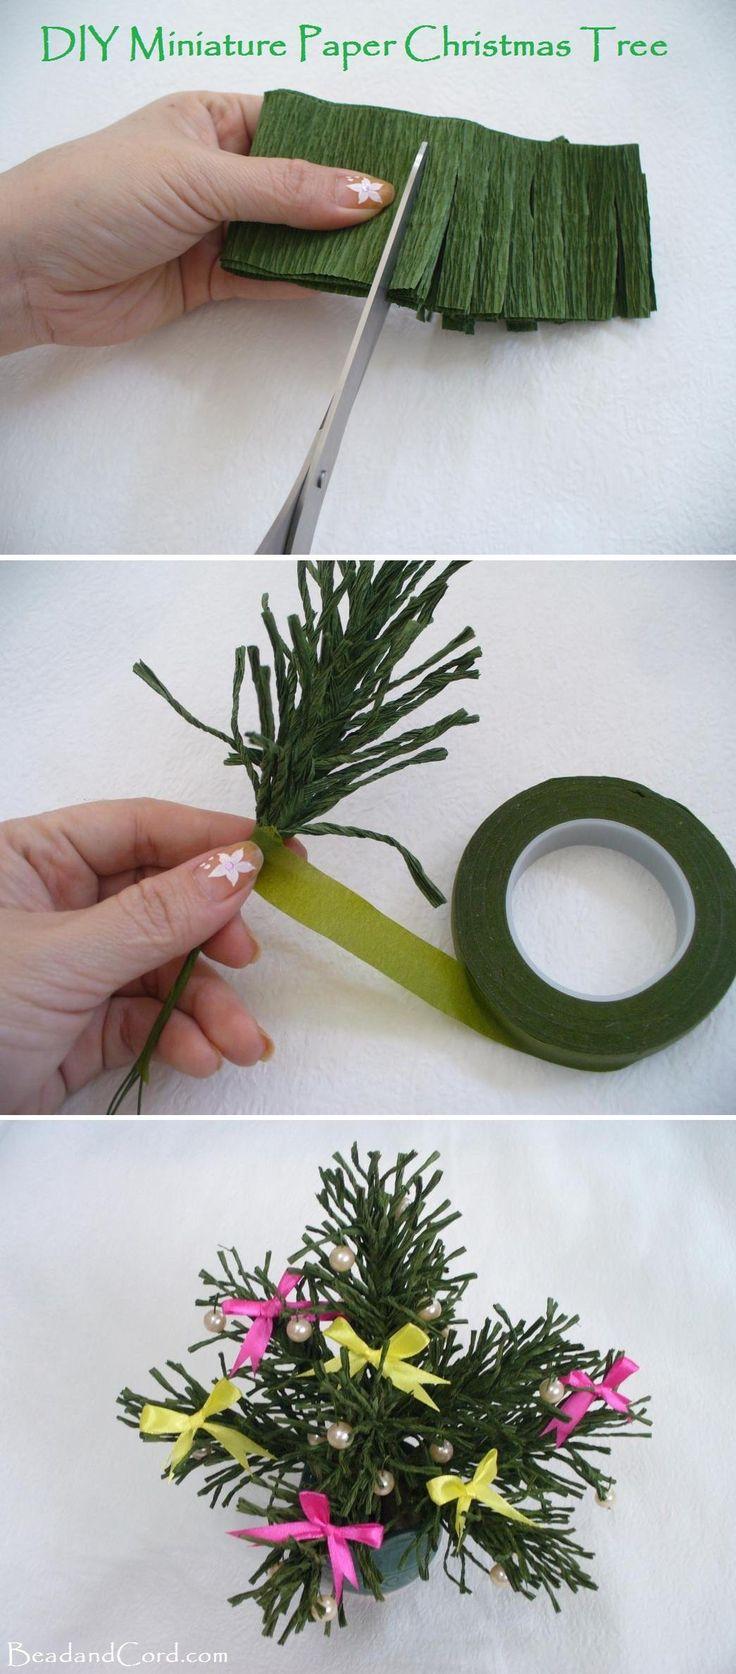 Christmas : DIY Miniature Christmas Tree Made of Paper